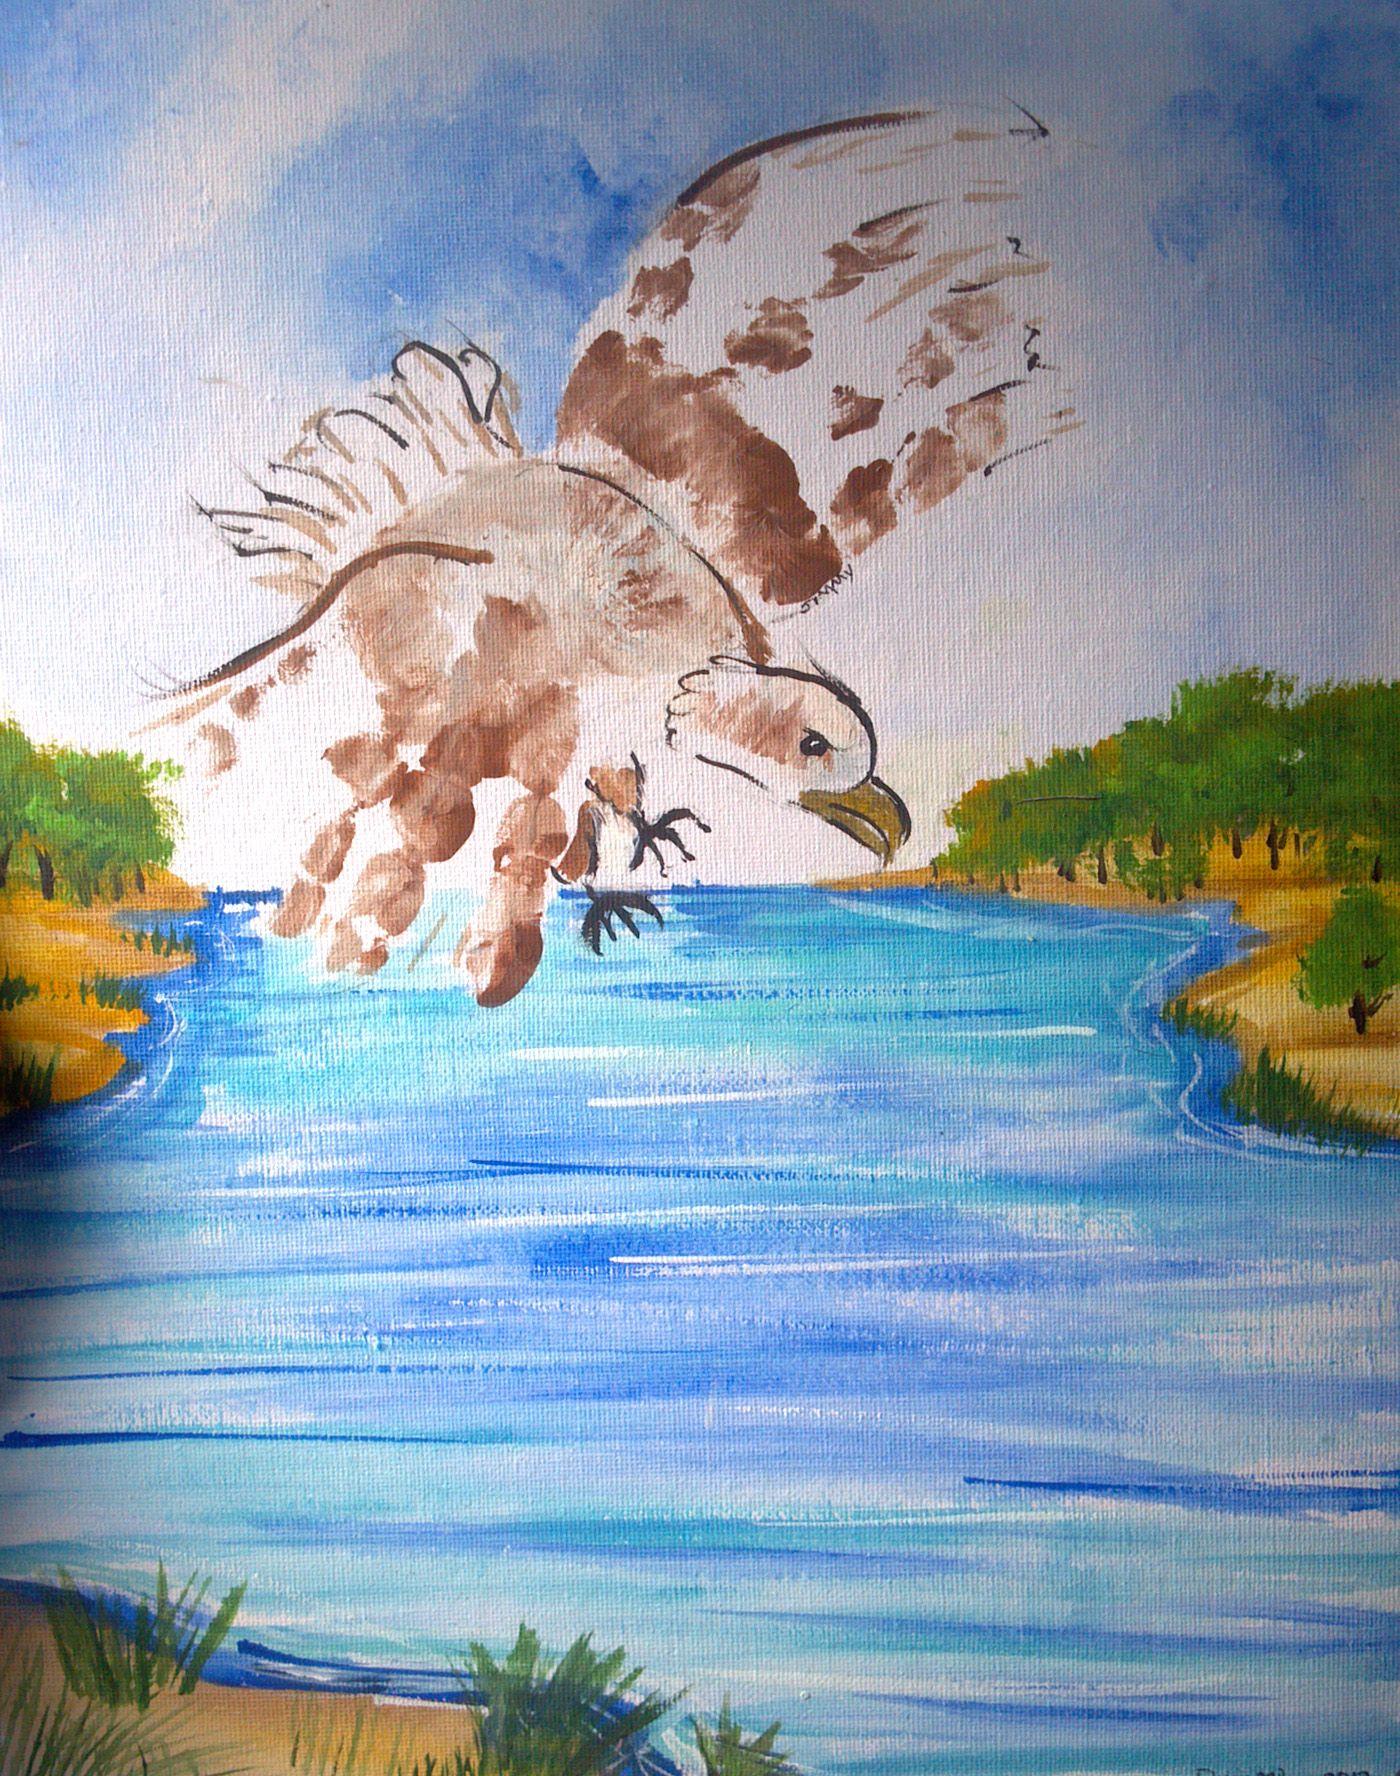 custom hand print or foot print art artwork painting keepsake